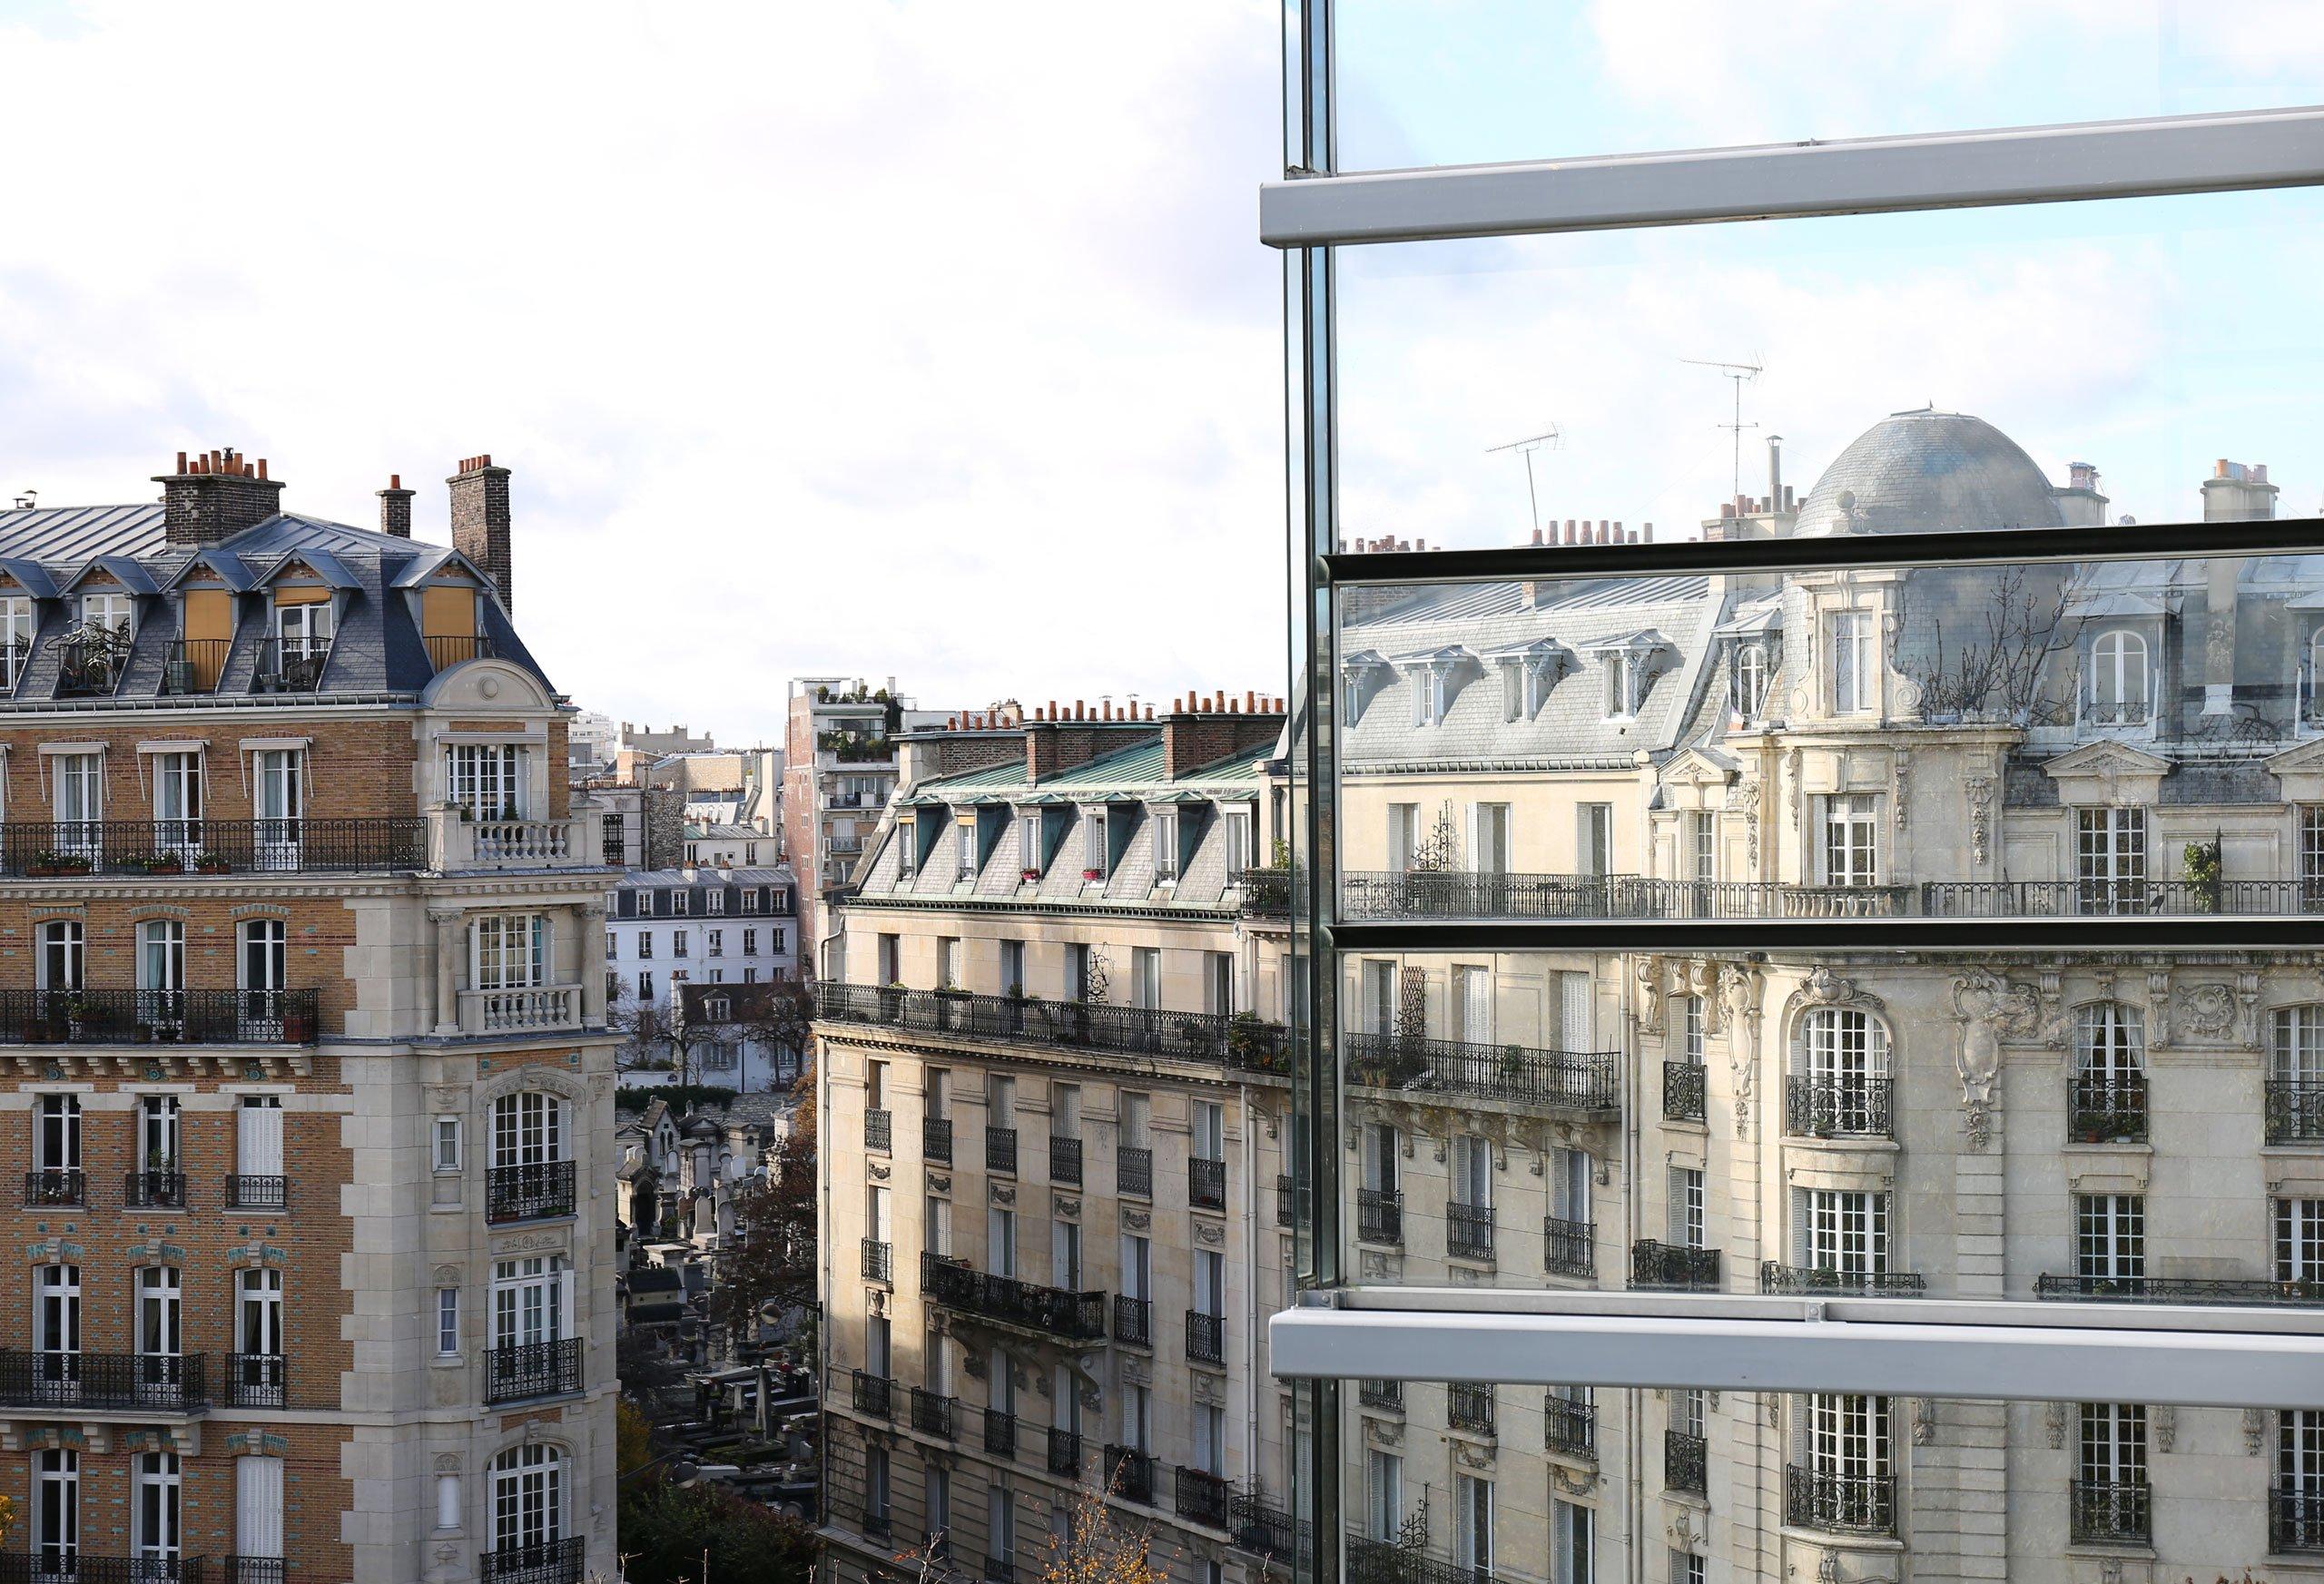 The view fromMathilde Laurent's office/laboratory on the top floor of the Jean Nouvel designed building, Fondation Cartier pour l'Art Contemporain, in Paris. Photo by Mohéli Rinaldi for Yatzer.